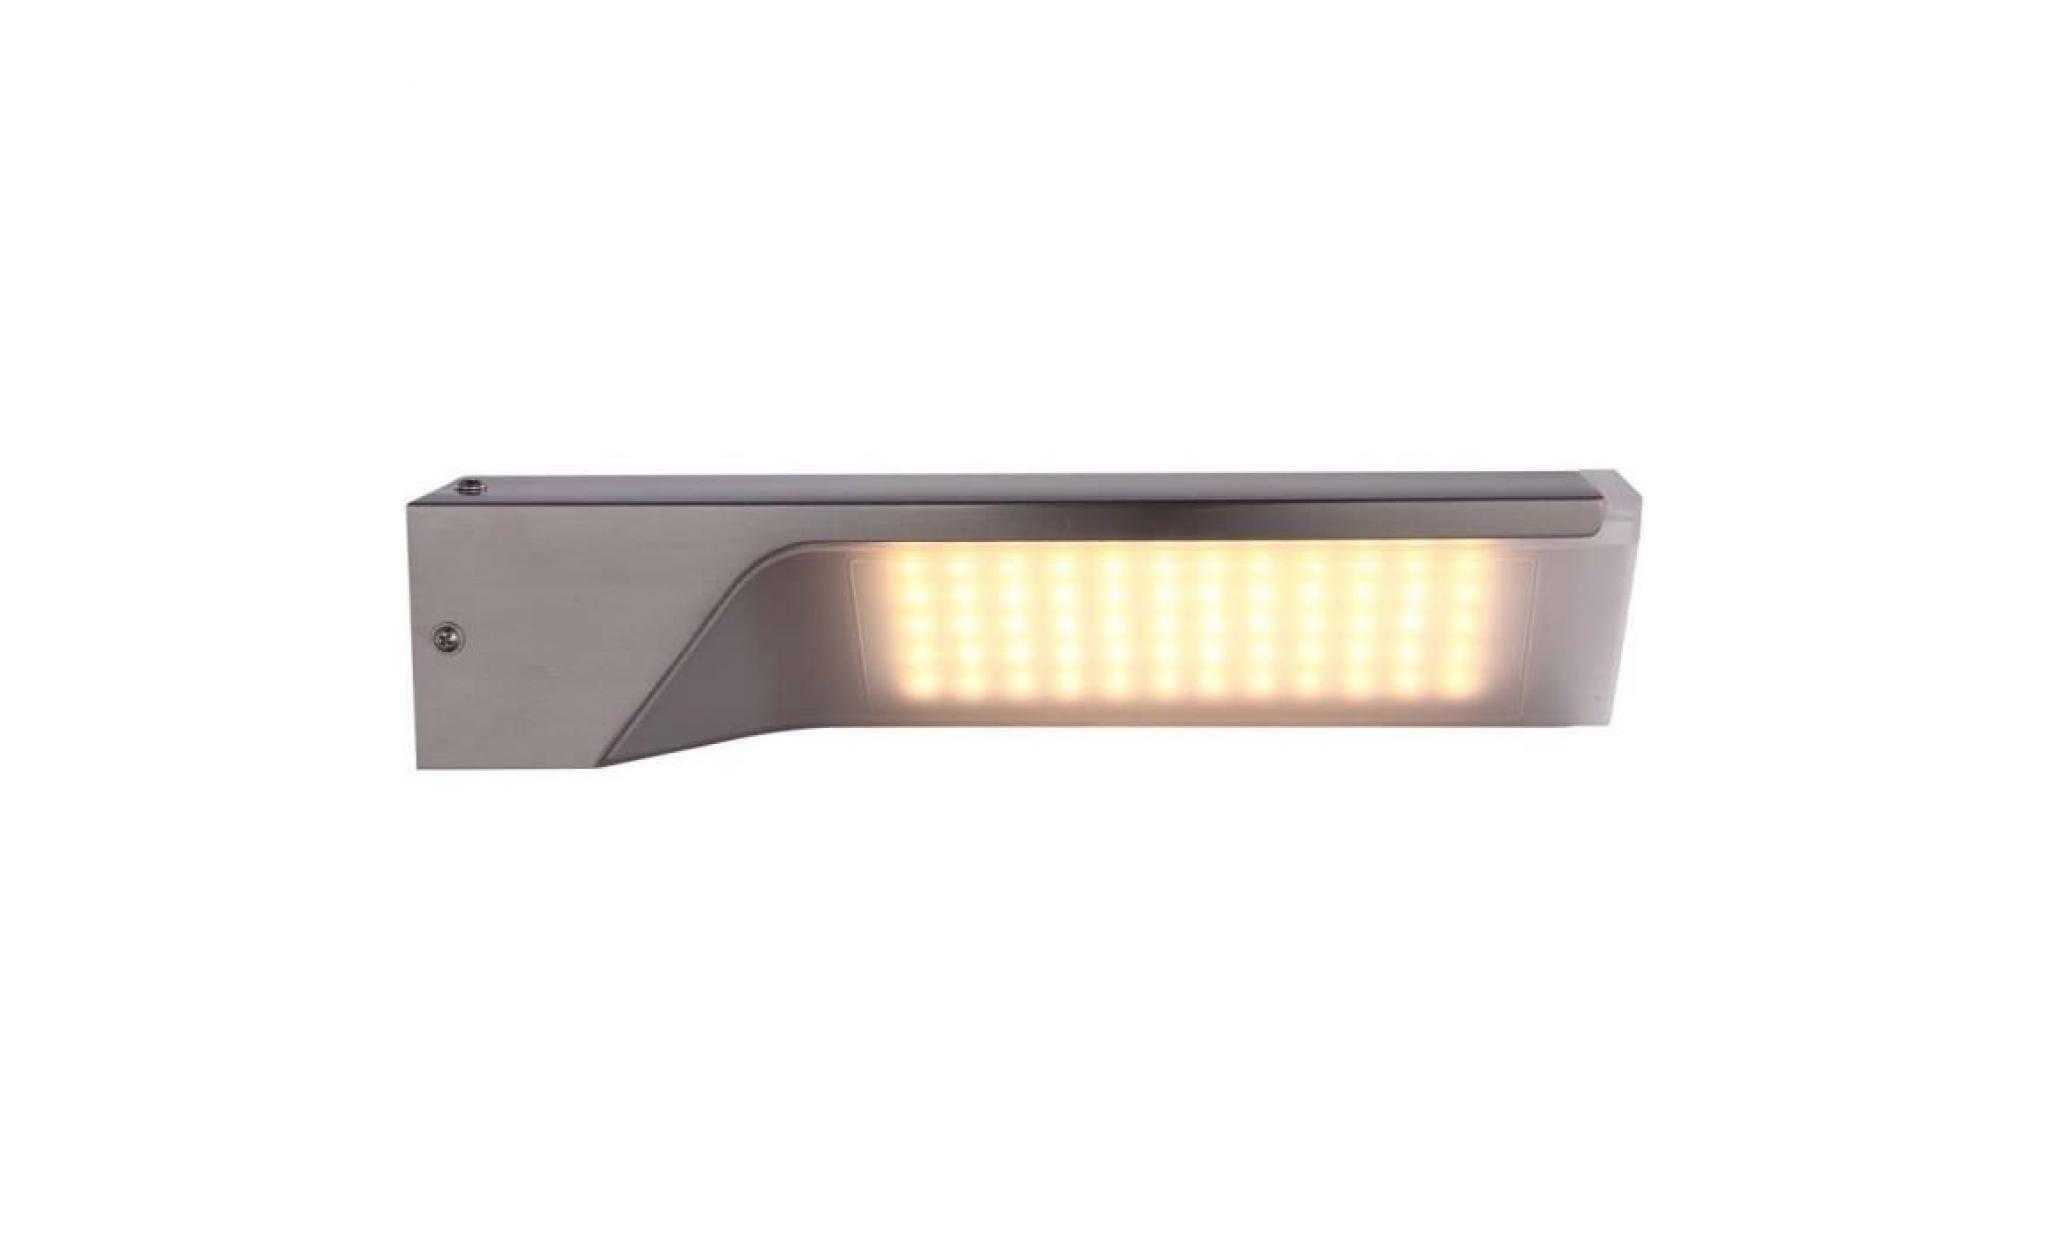 applique ext rieure luminaire mural lampe acier inoxydable. Black Bedroom Furniture Sets. Home Design Ideas